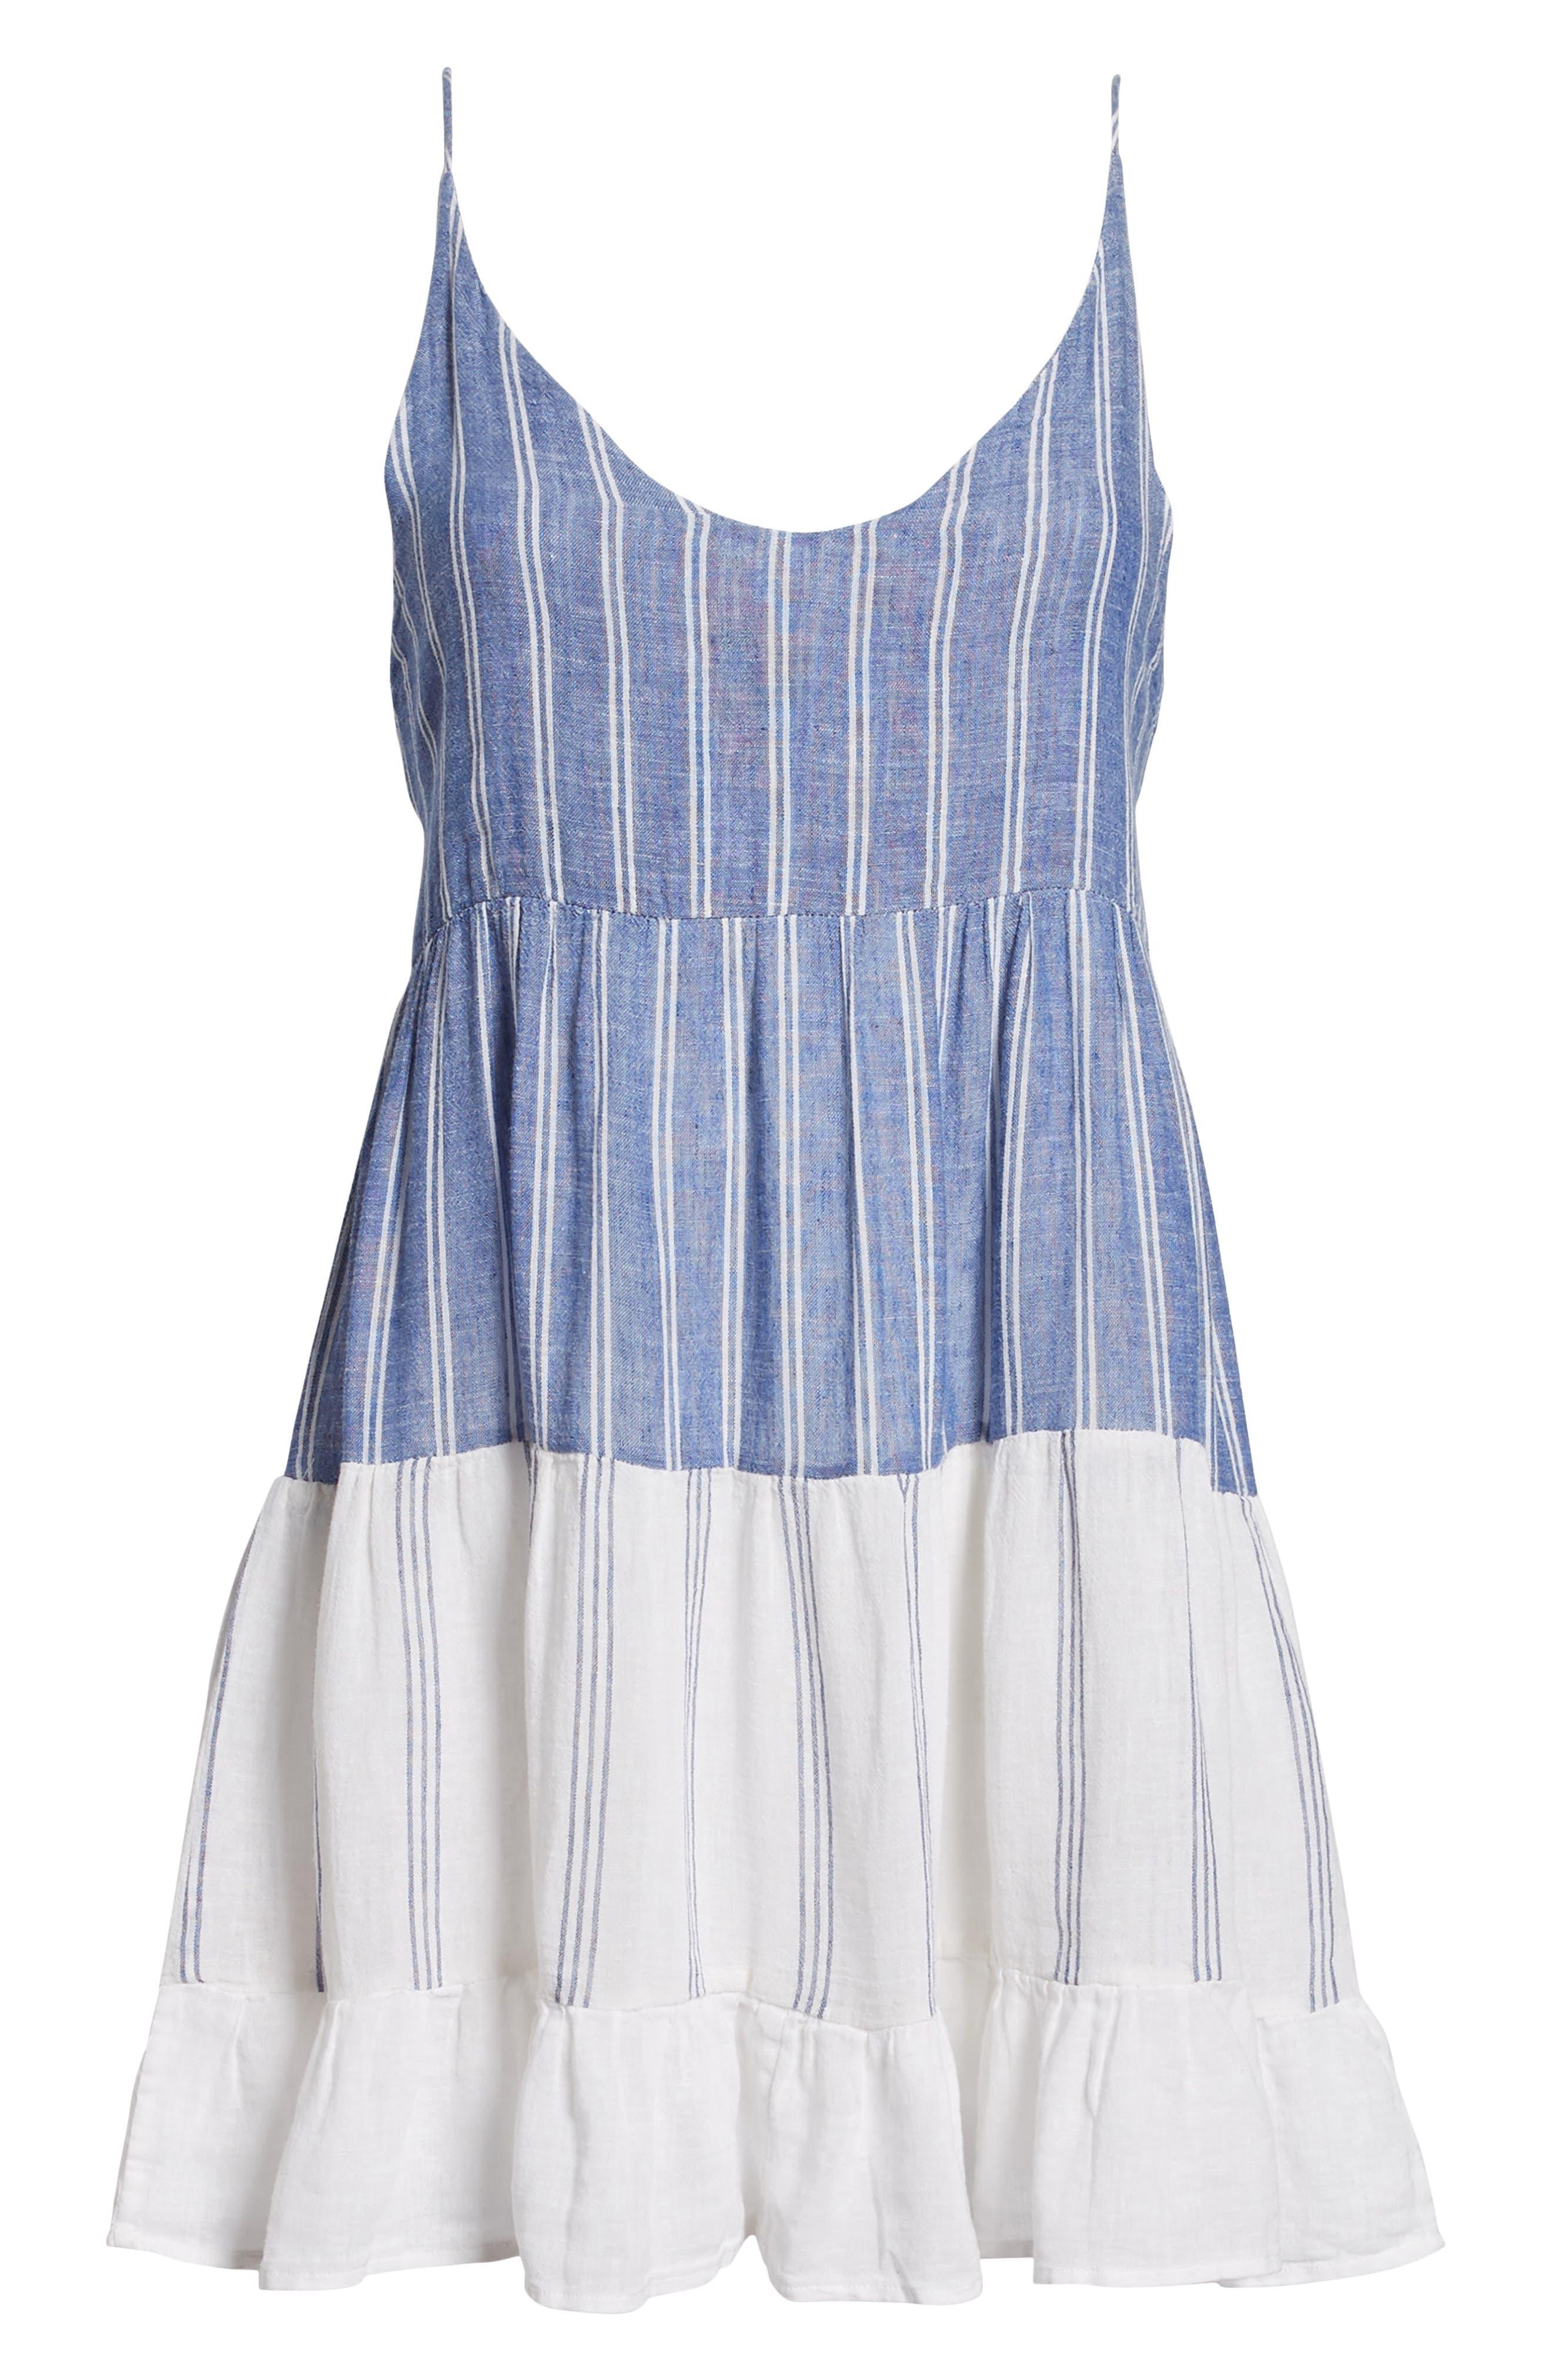 Mattie Dress,                             Alternate thumbnail 6, color,                             Mixed Blues Stripe